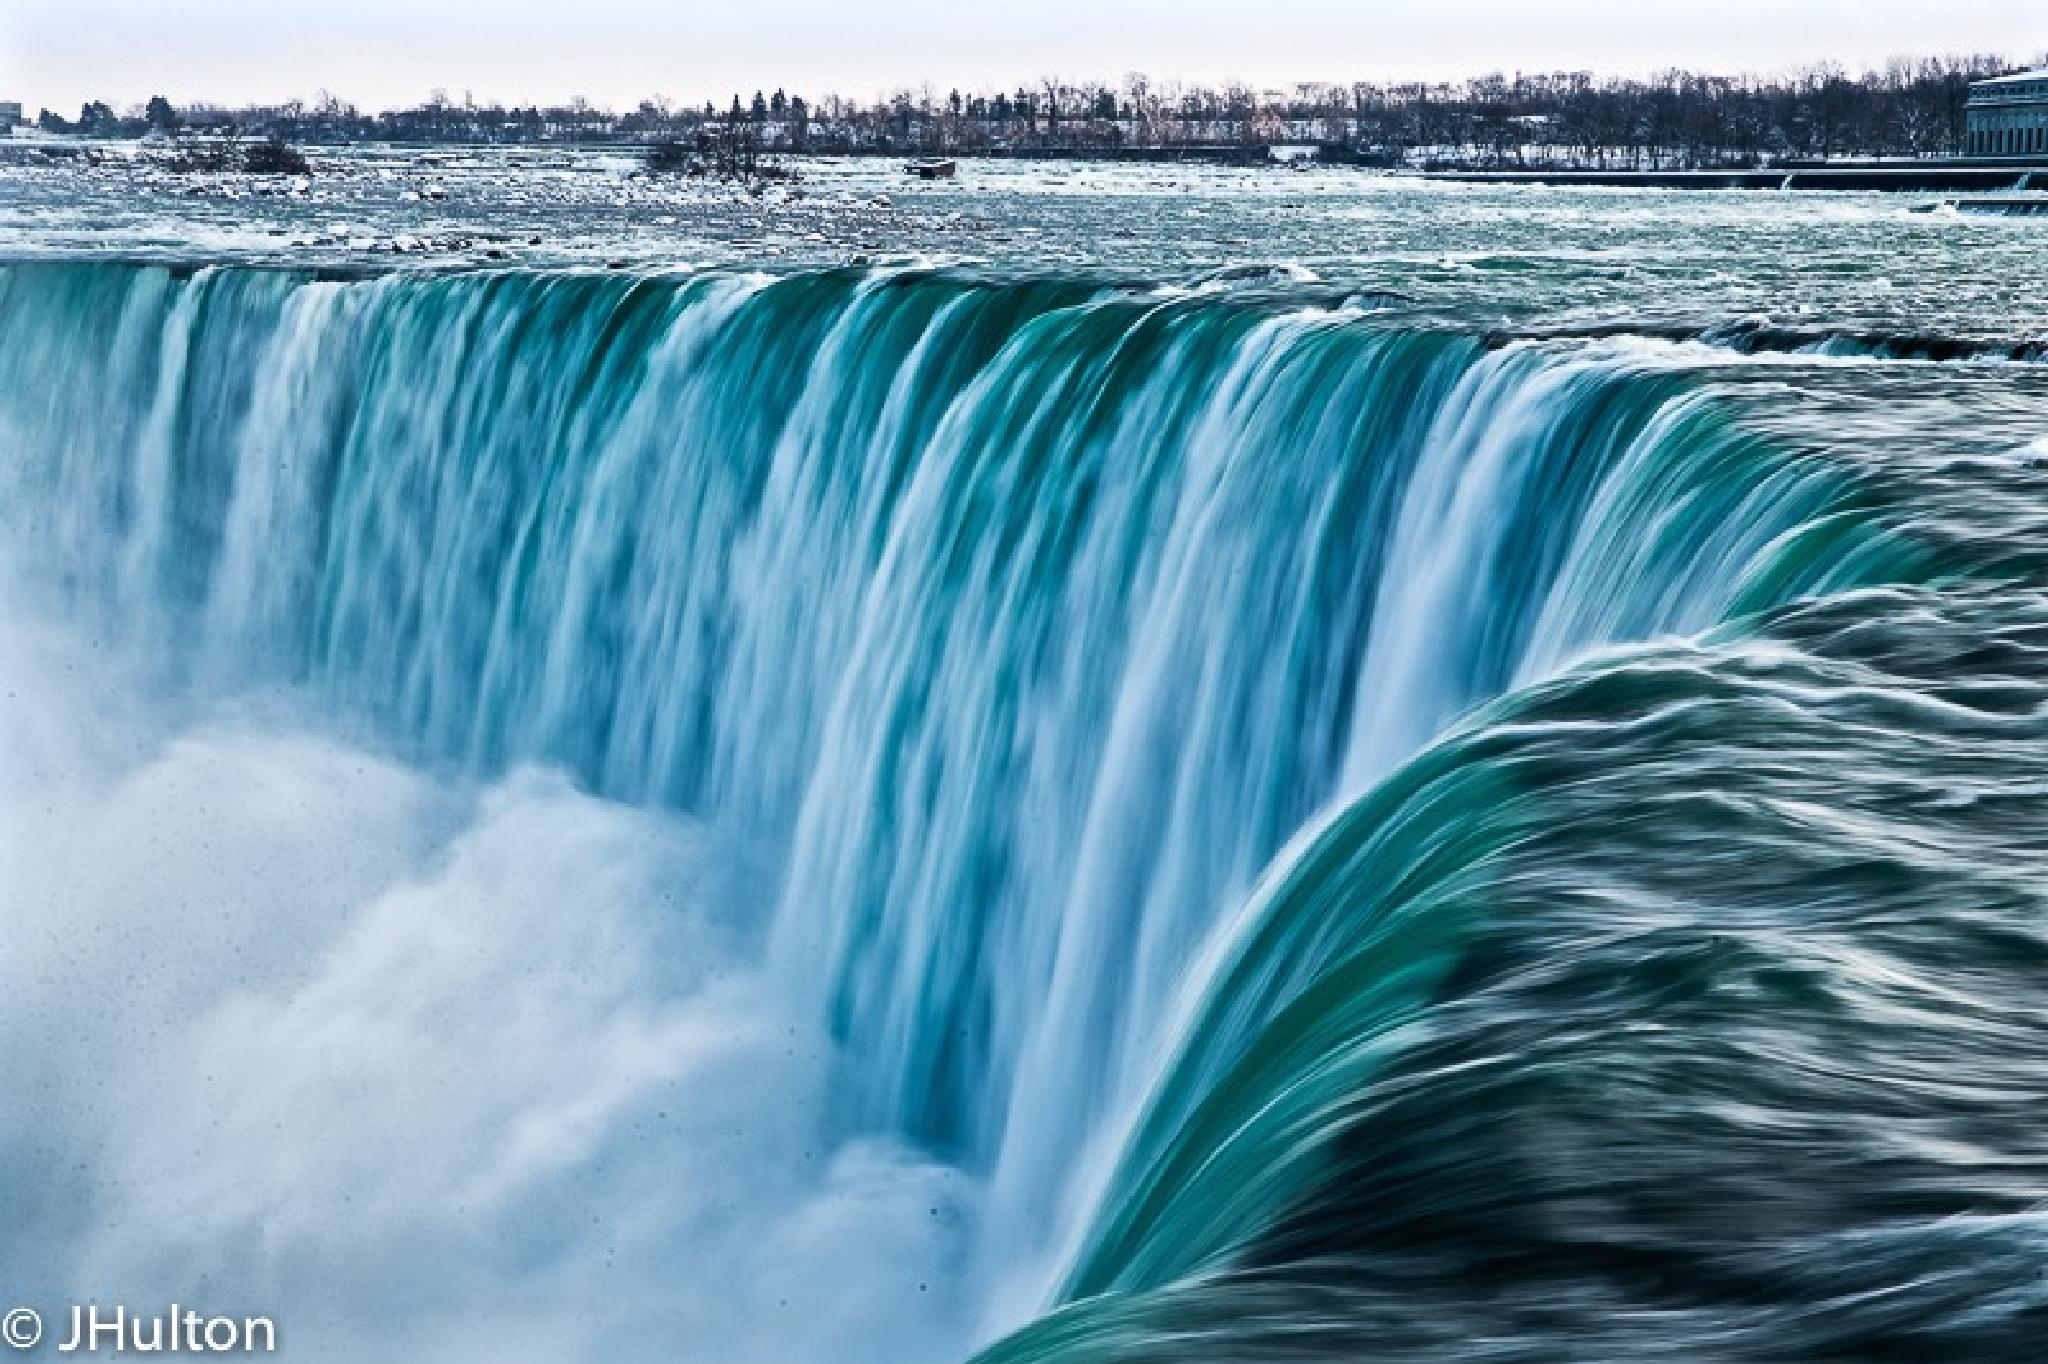 Niagara Falls by jhulton